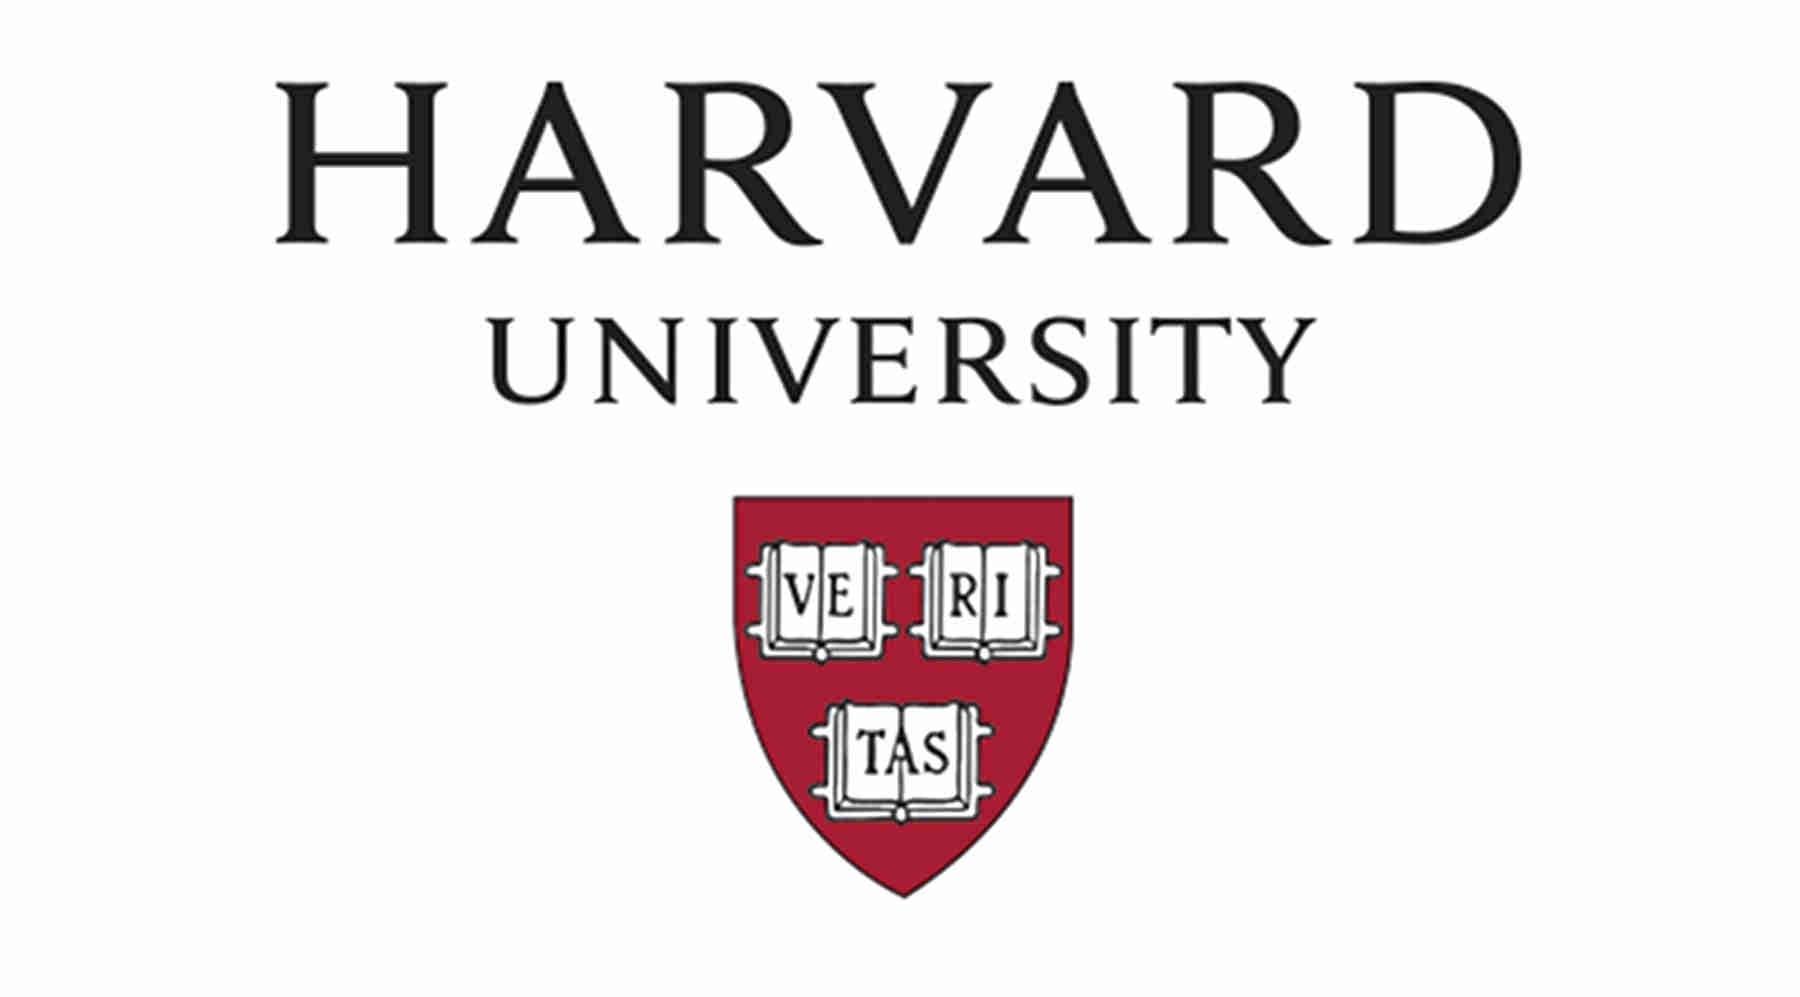 Harvard University Wallpaper